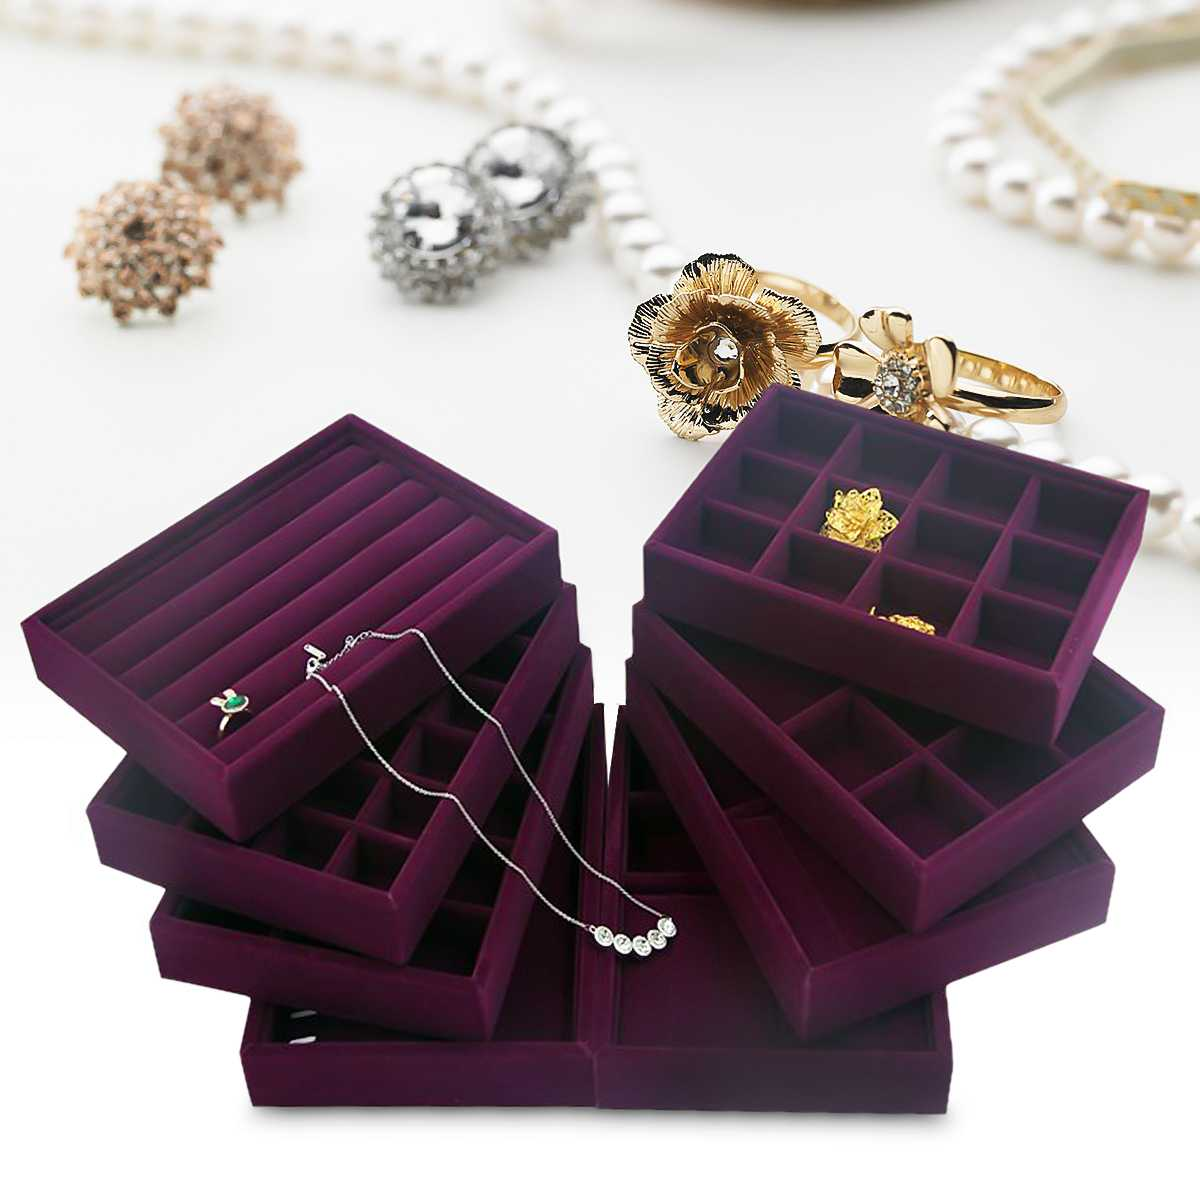 Anillo de terciopelo púrpura caja organizadora bandeja soporte collar pendientes brazalete caja de almacenamiento escaparate joyas soporte